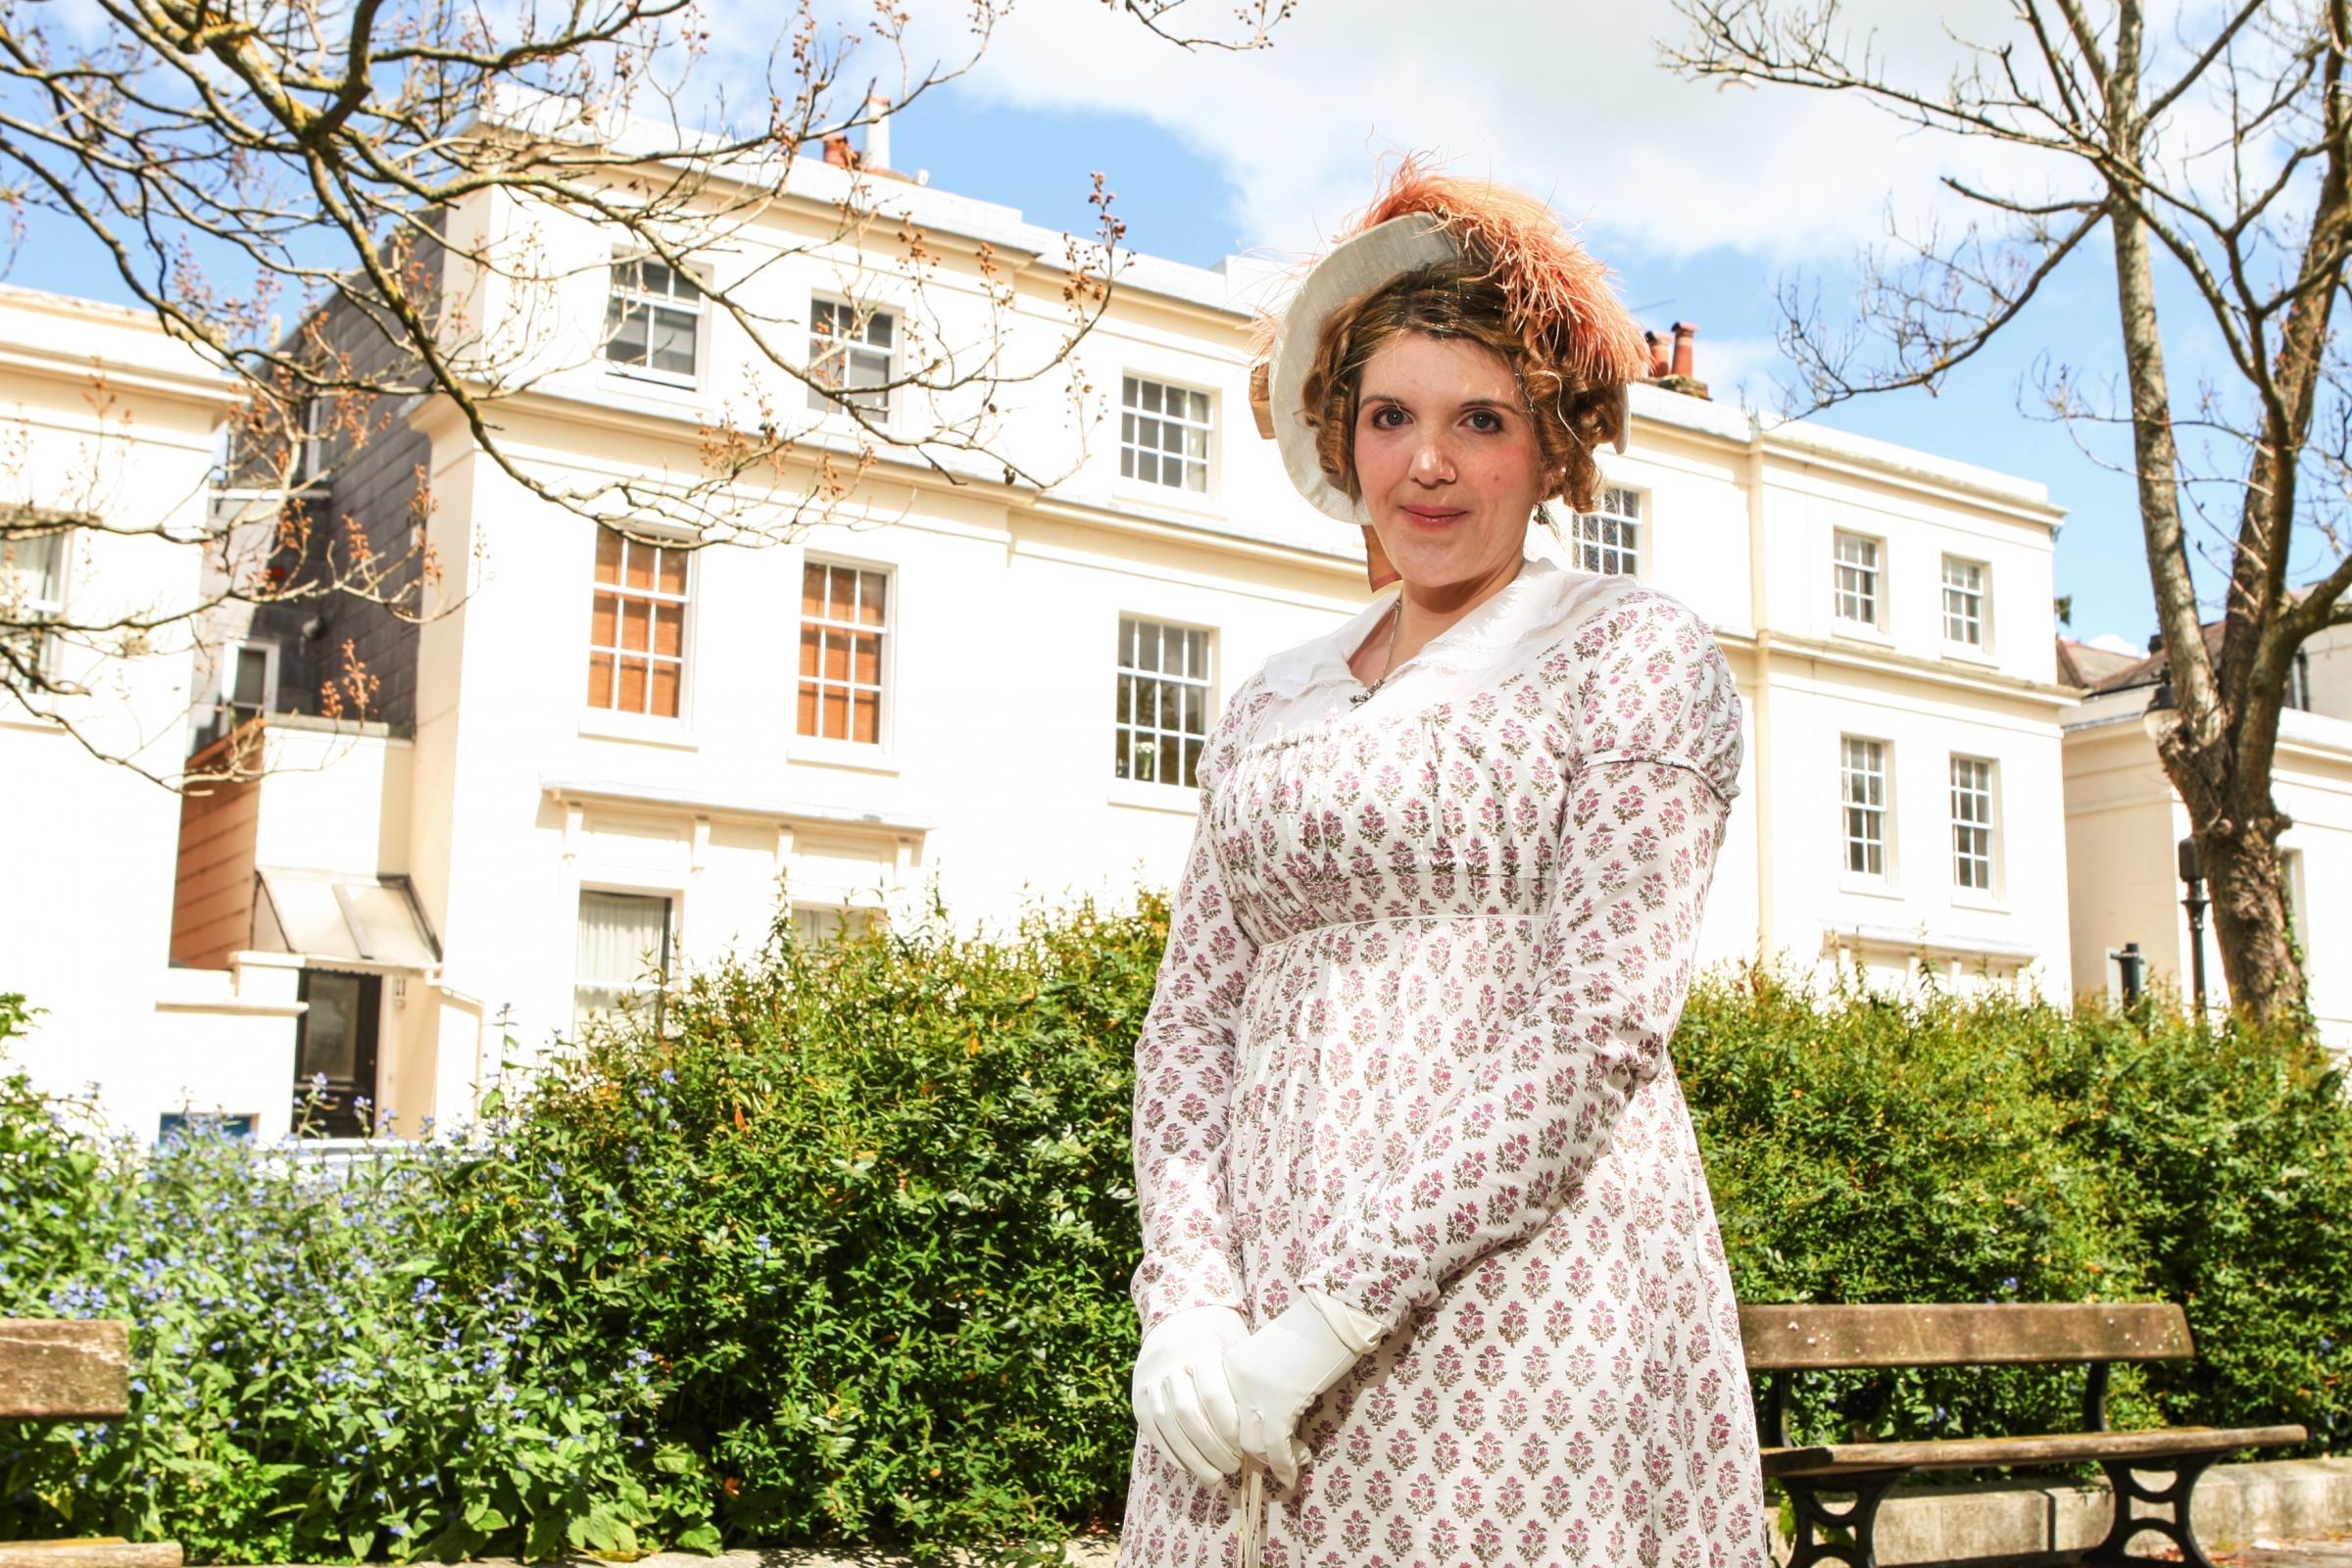 Claire-Violet Hanley in Regency costume